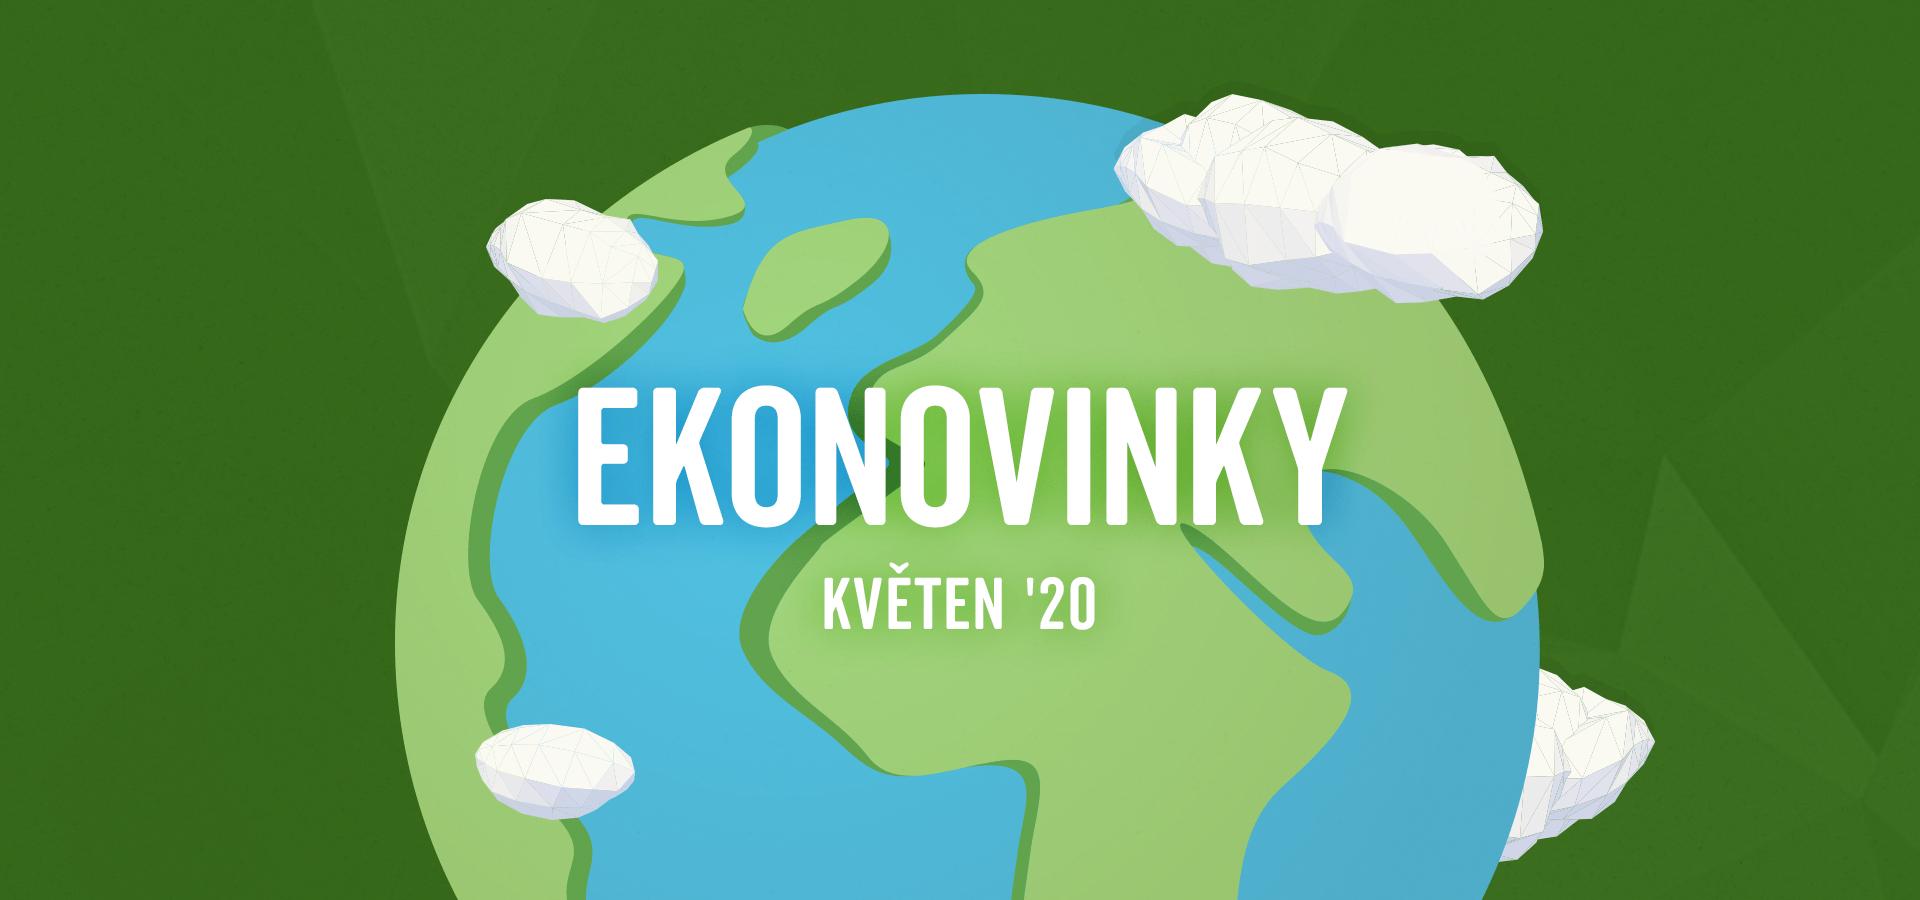 ekonovinky_planeta_zeme_kveten_2020